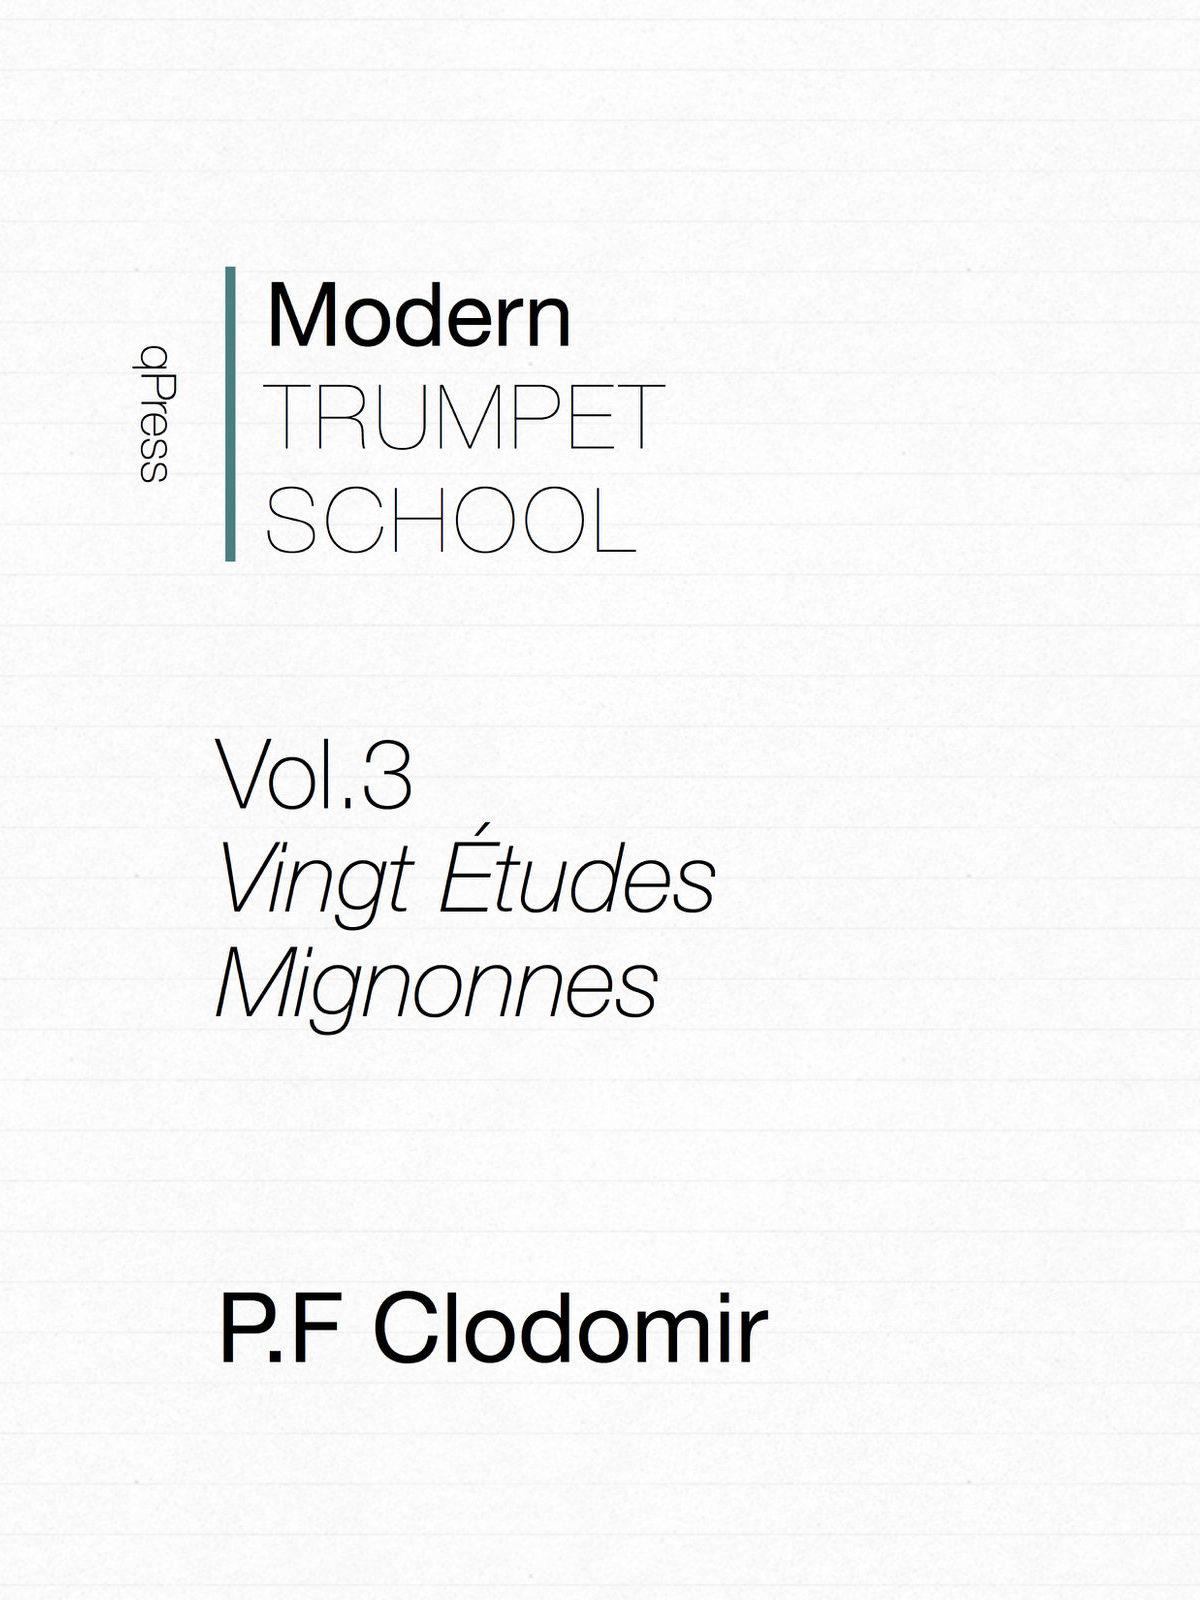 clodomir-vol-3-mignonnes